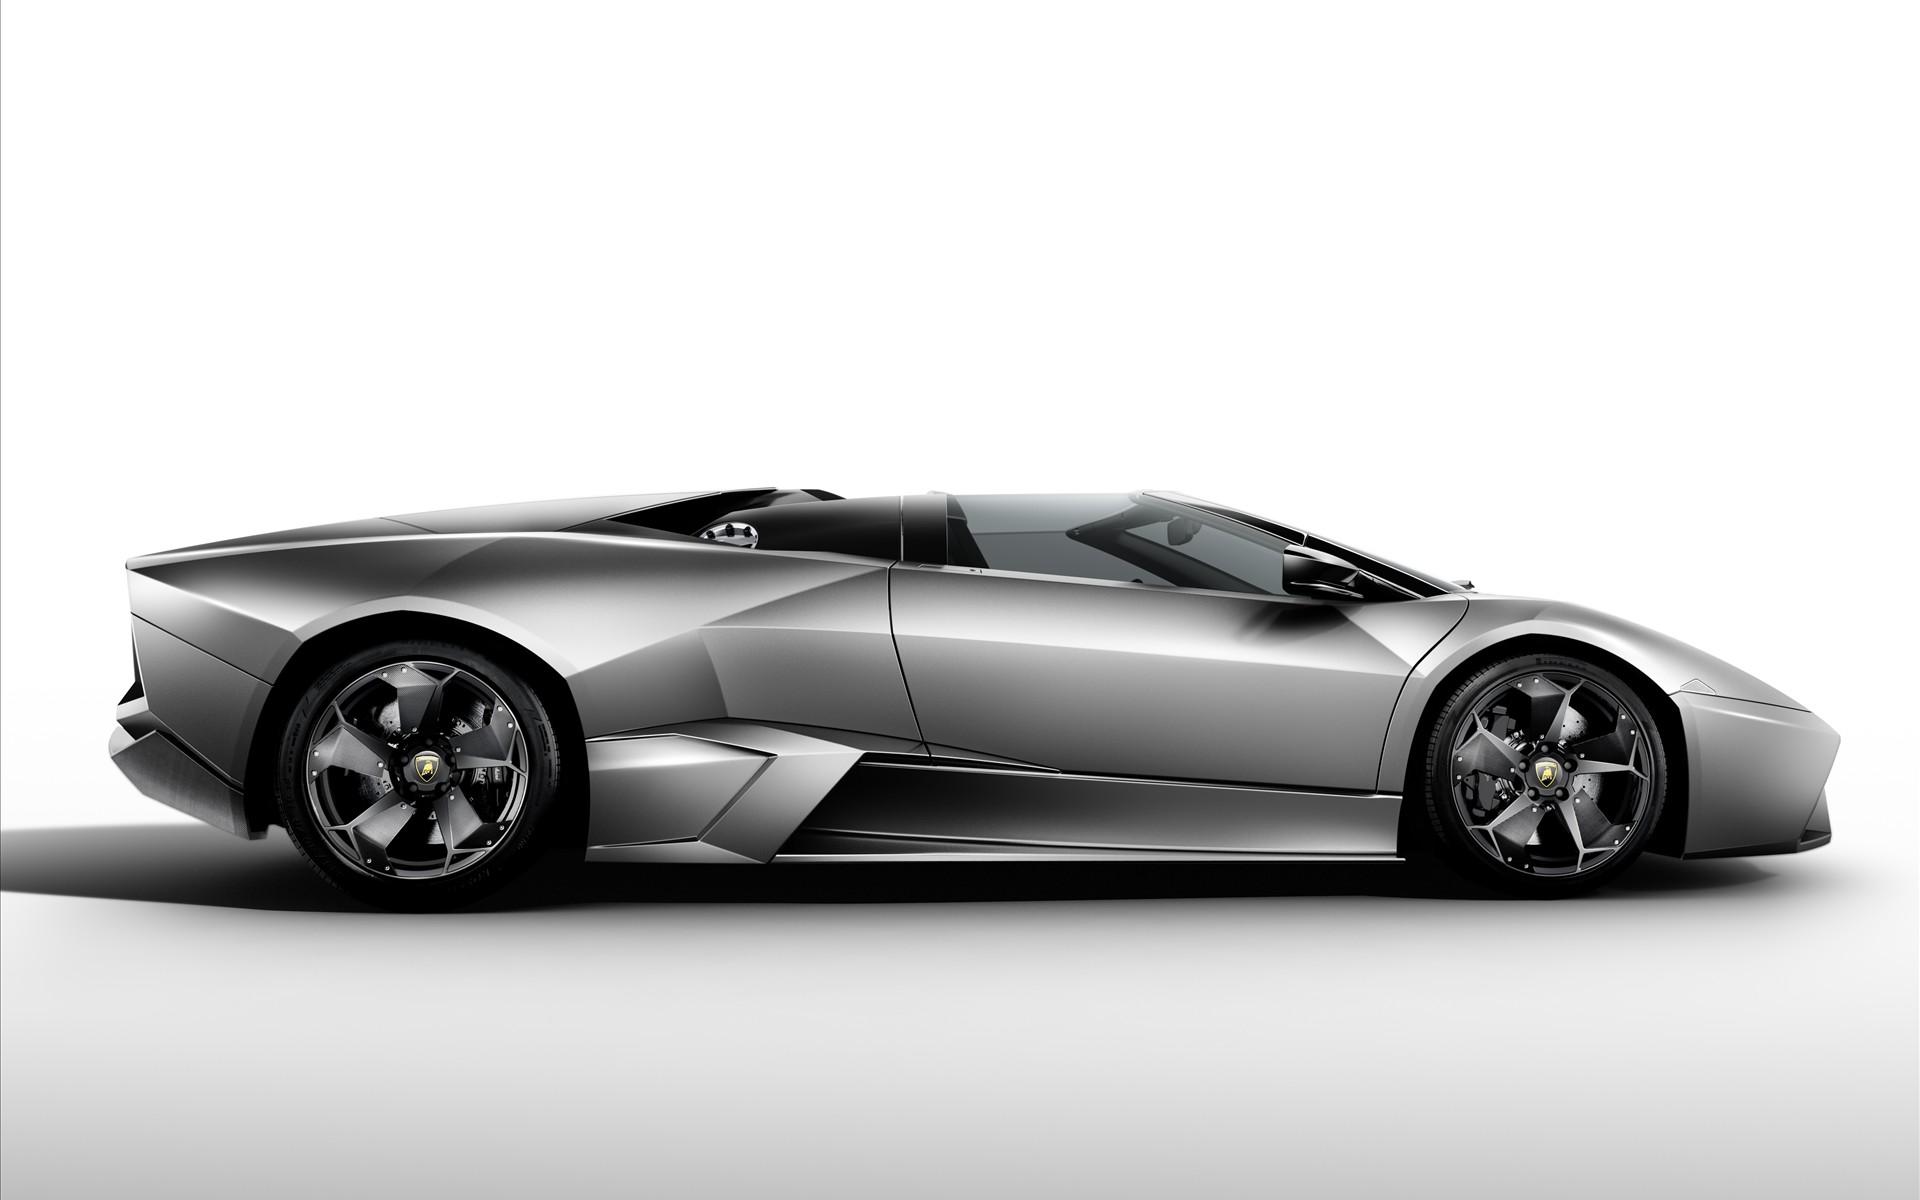 lamborghini-reventon-rqzk5 Extraordinary Lamborghini Countach Schwer Zu Fahren Cars Trend